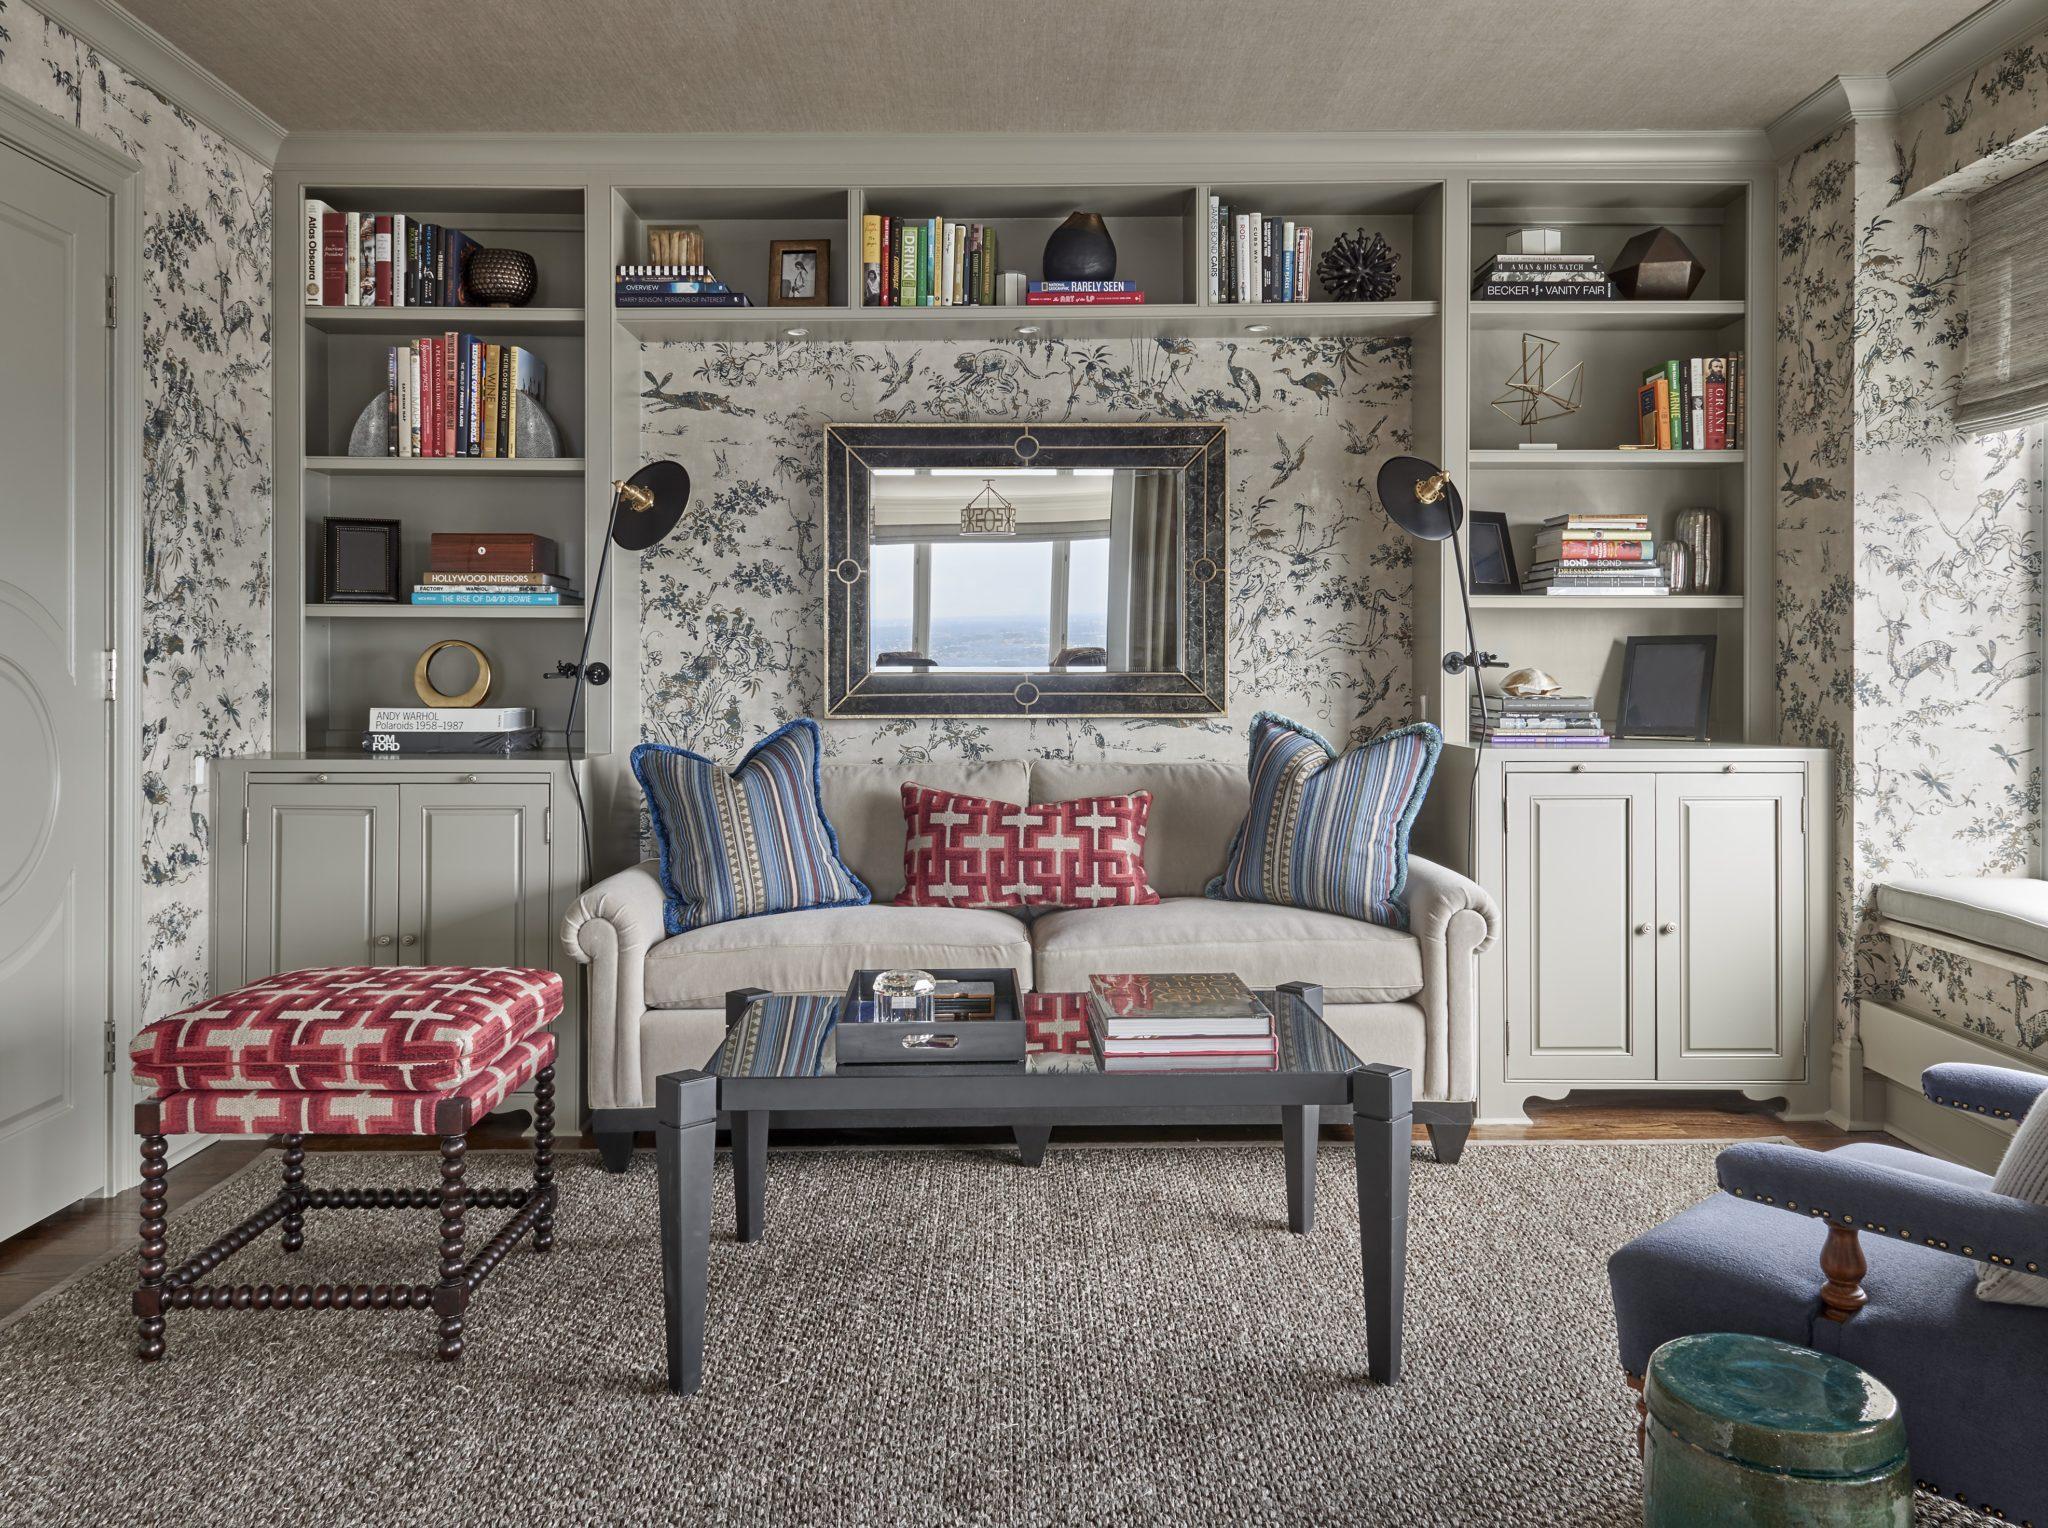 Four Seasons Residence by Frank Ponterio Interior Design